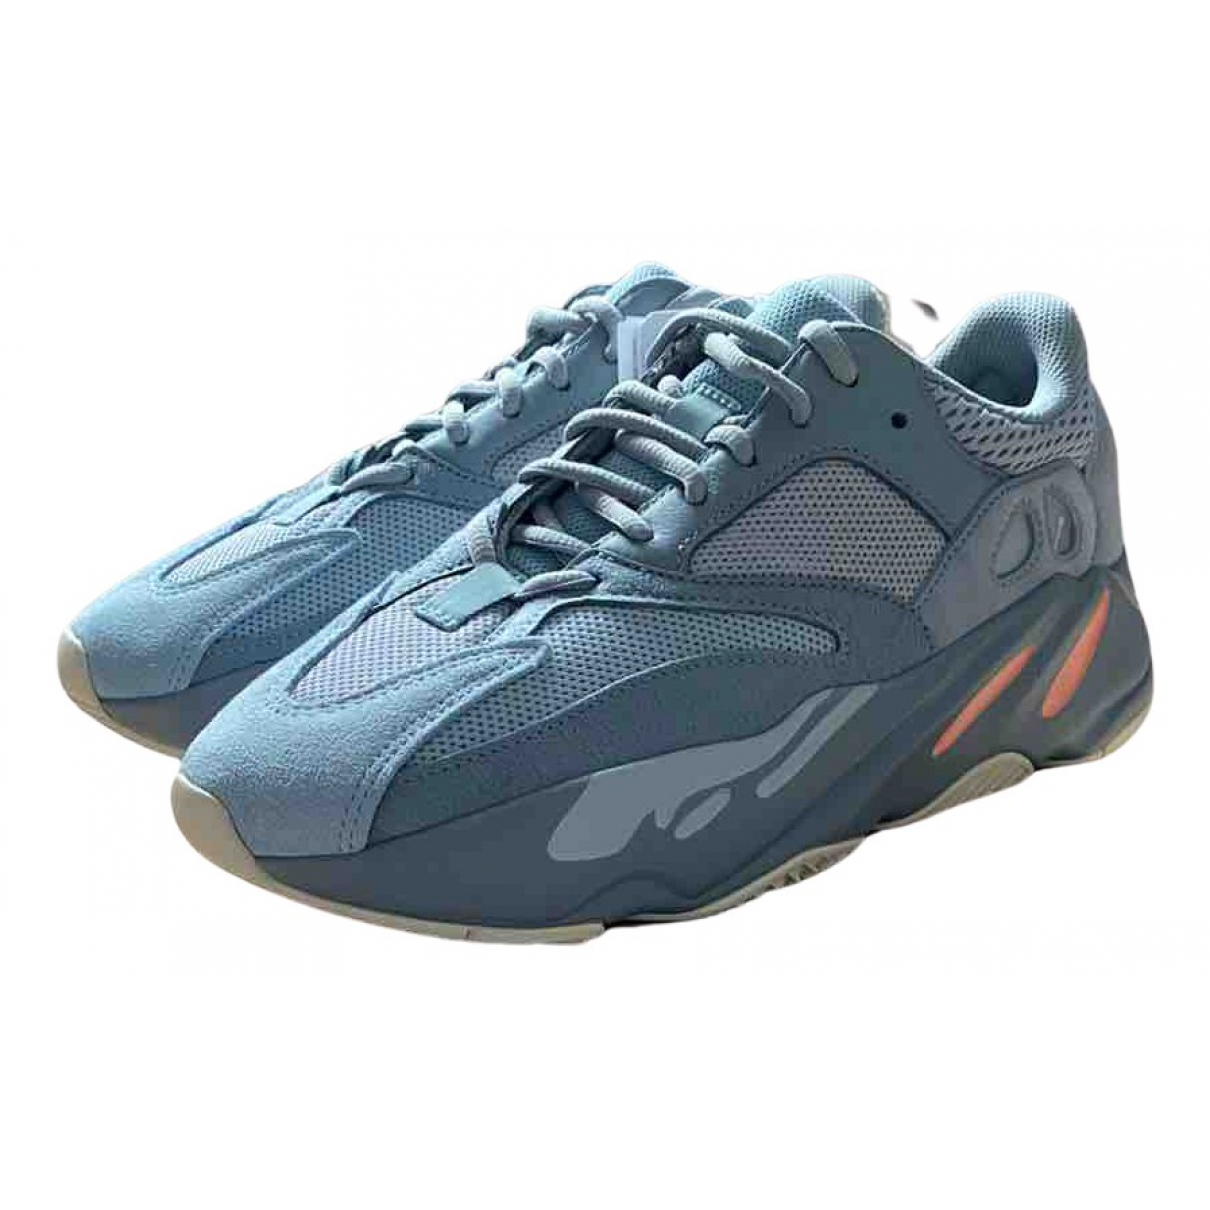 Yeezy X Adidas - Baskets Boost 700 V2 pour homme en suede - bleu